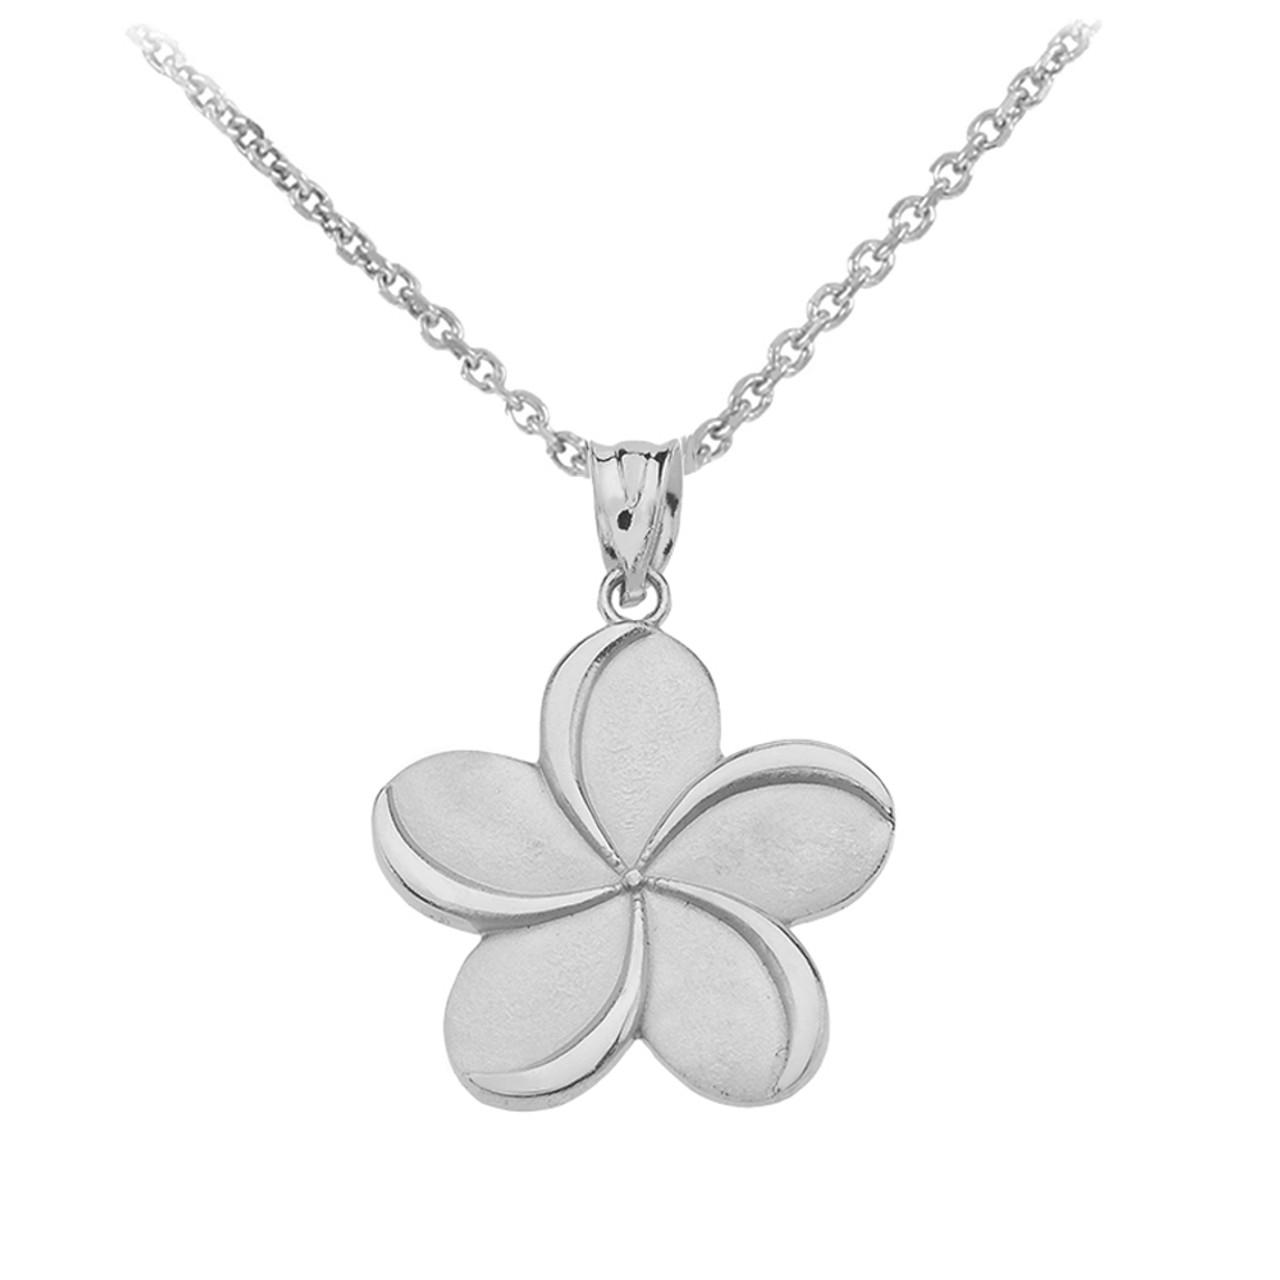 Sterling silver hawaiian plumeria flower pendant necklace izmirmasajfo